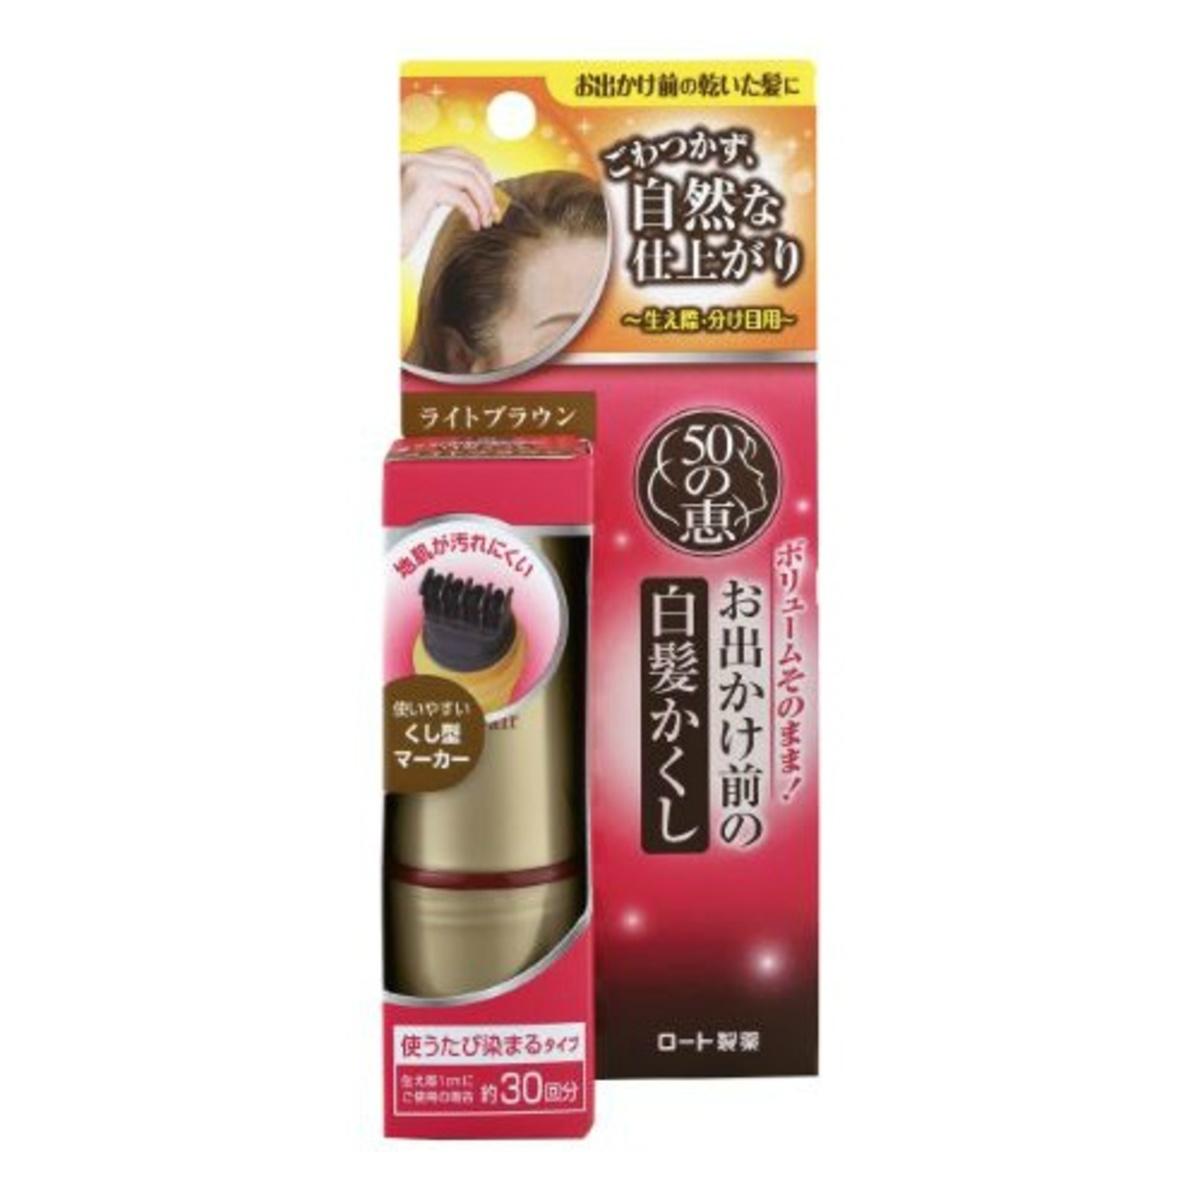 Hair Colorant pen 10ml (Brown)